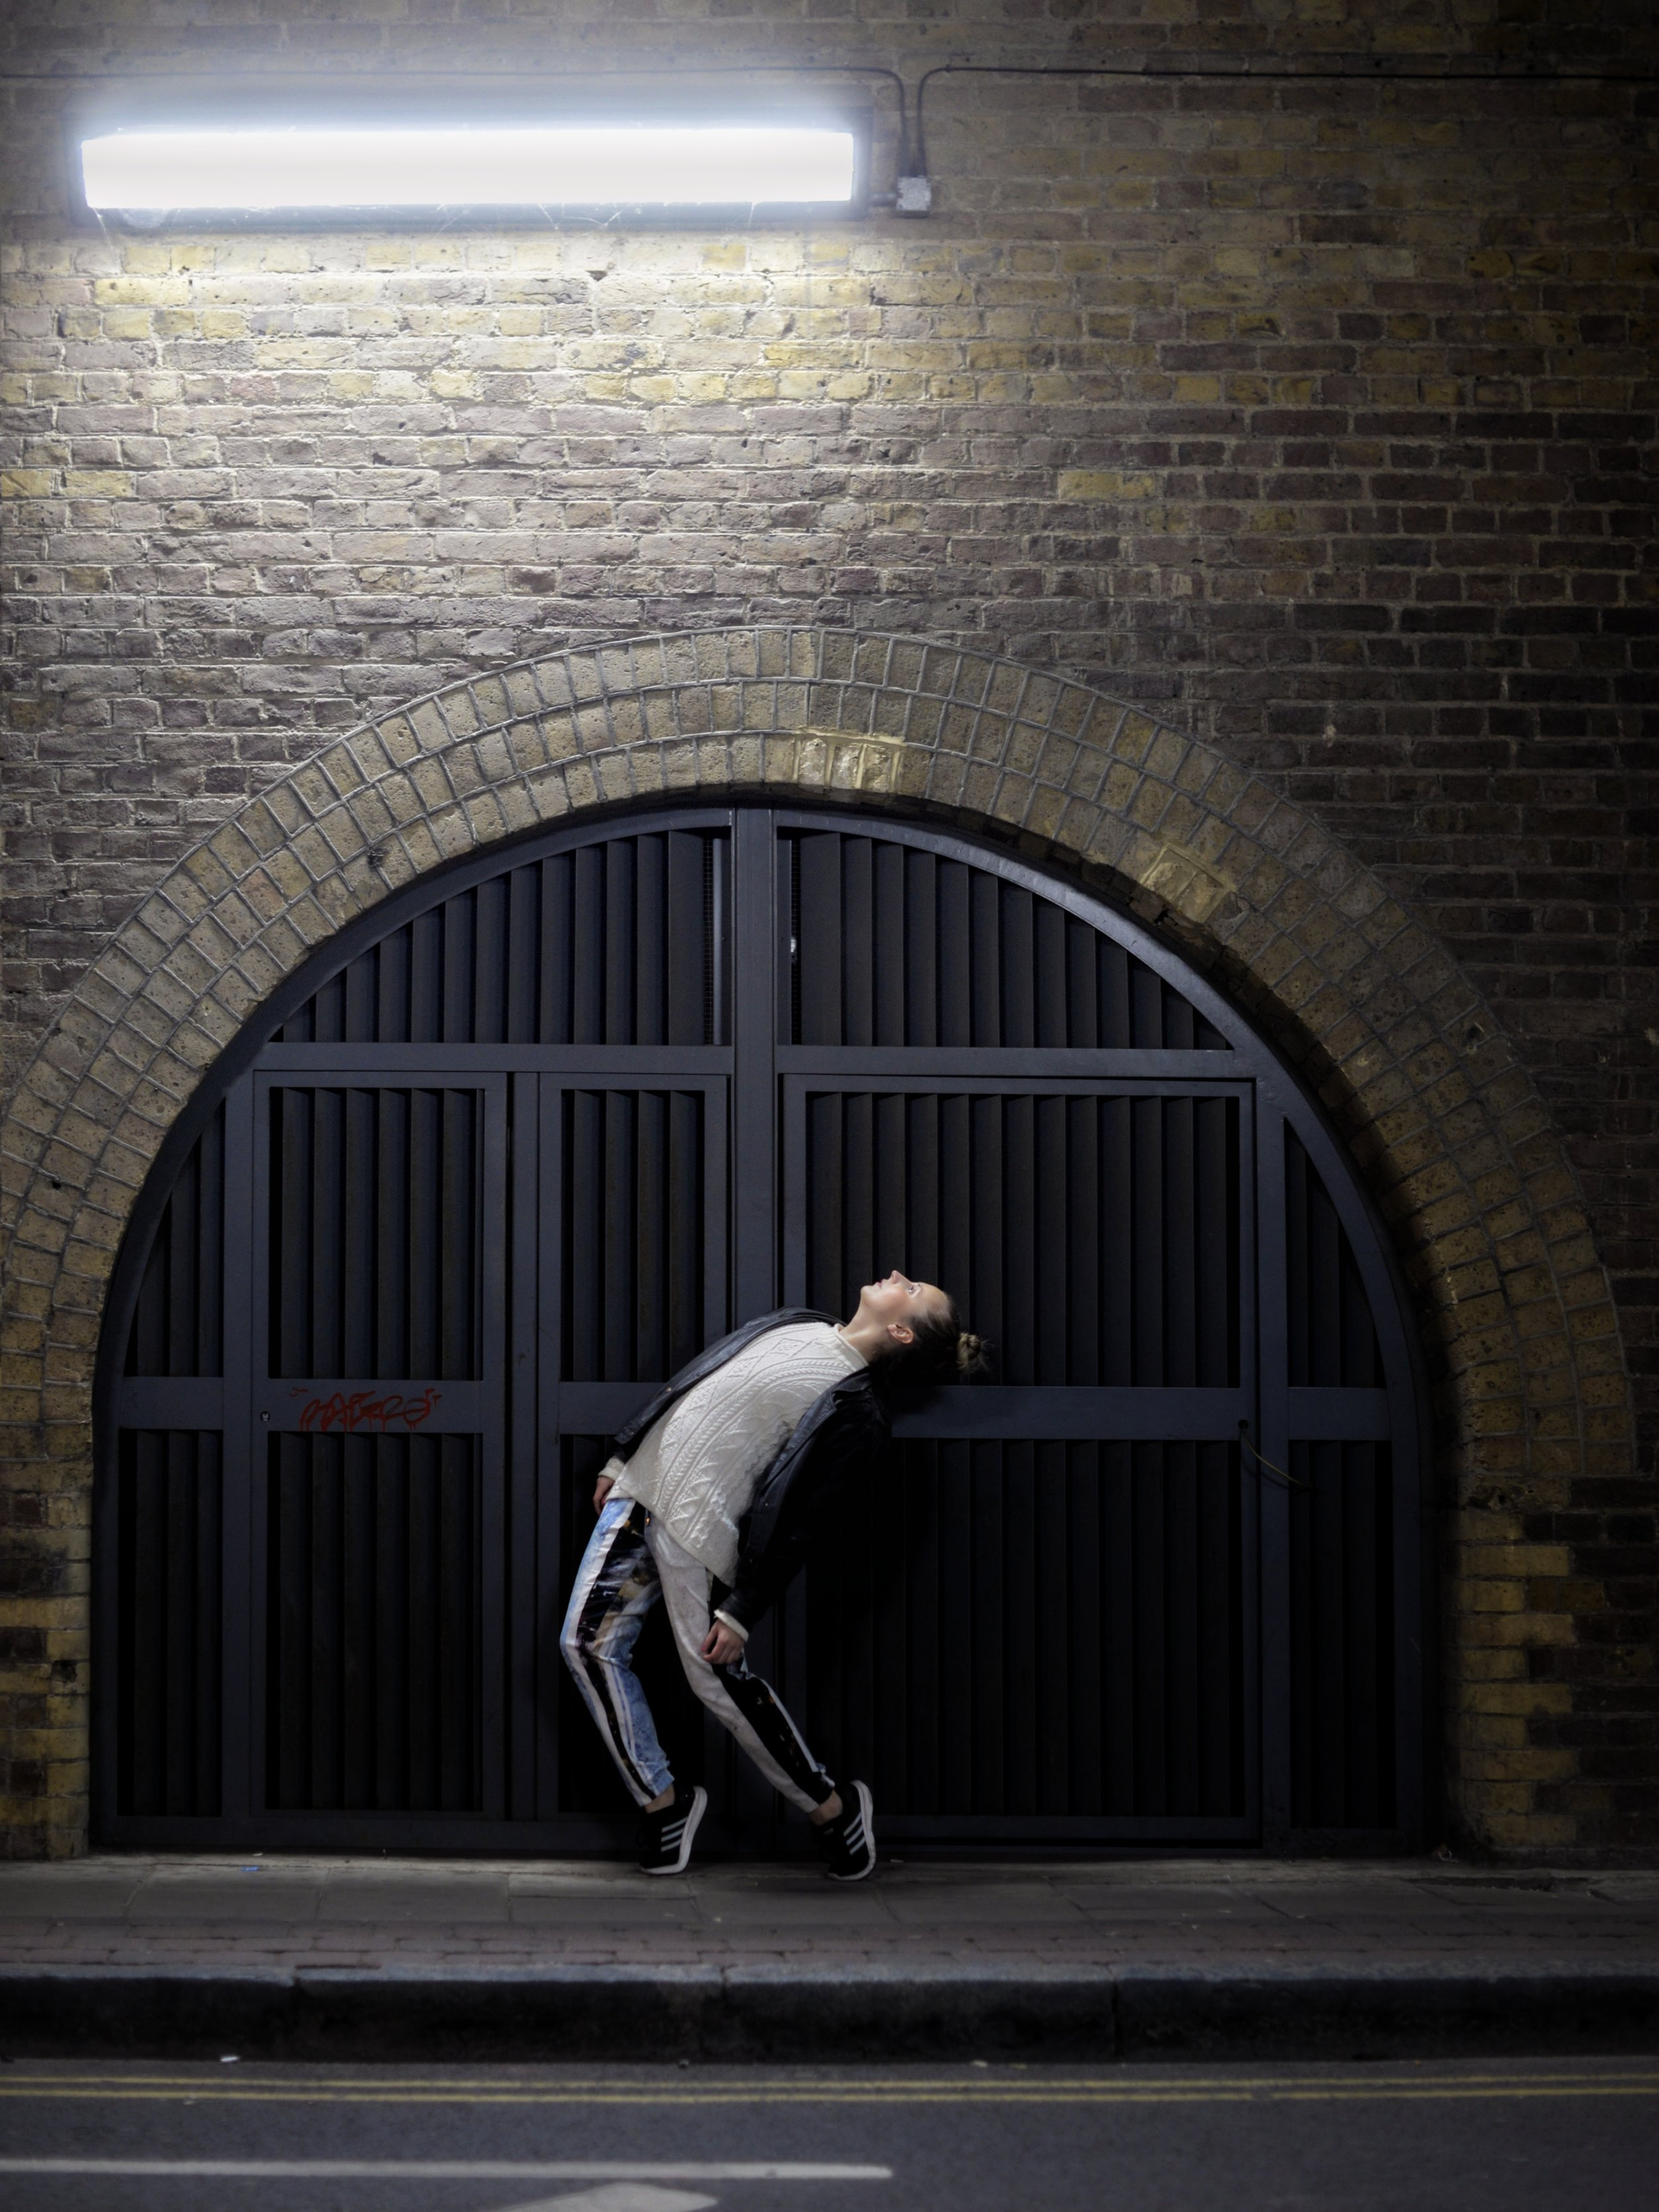 7PM  ⫩Treveris St., Southwark, London dancer:   Eloise Harulow